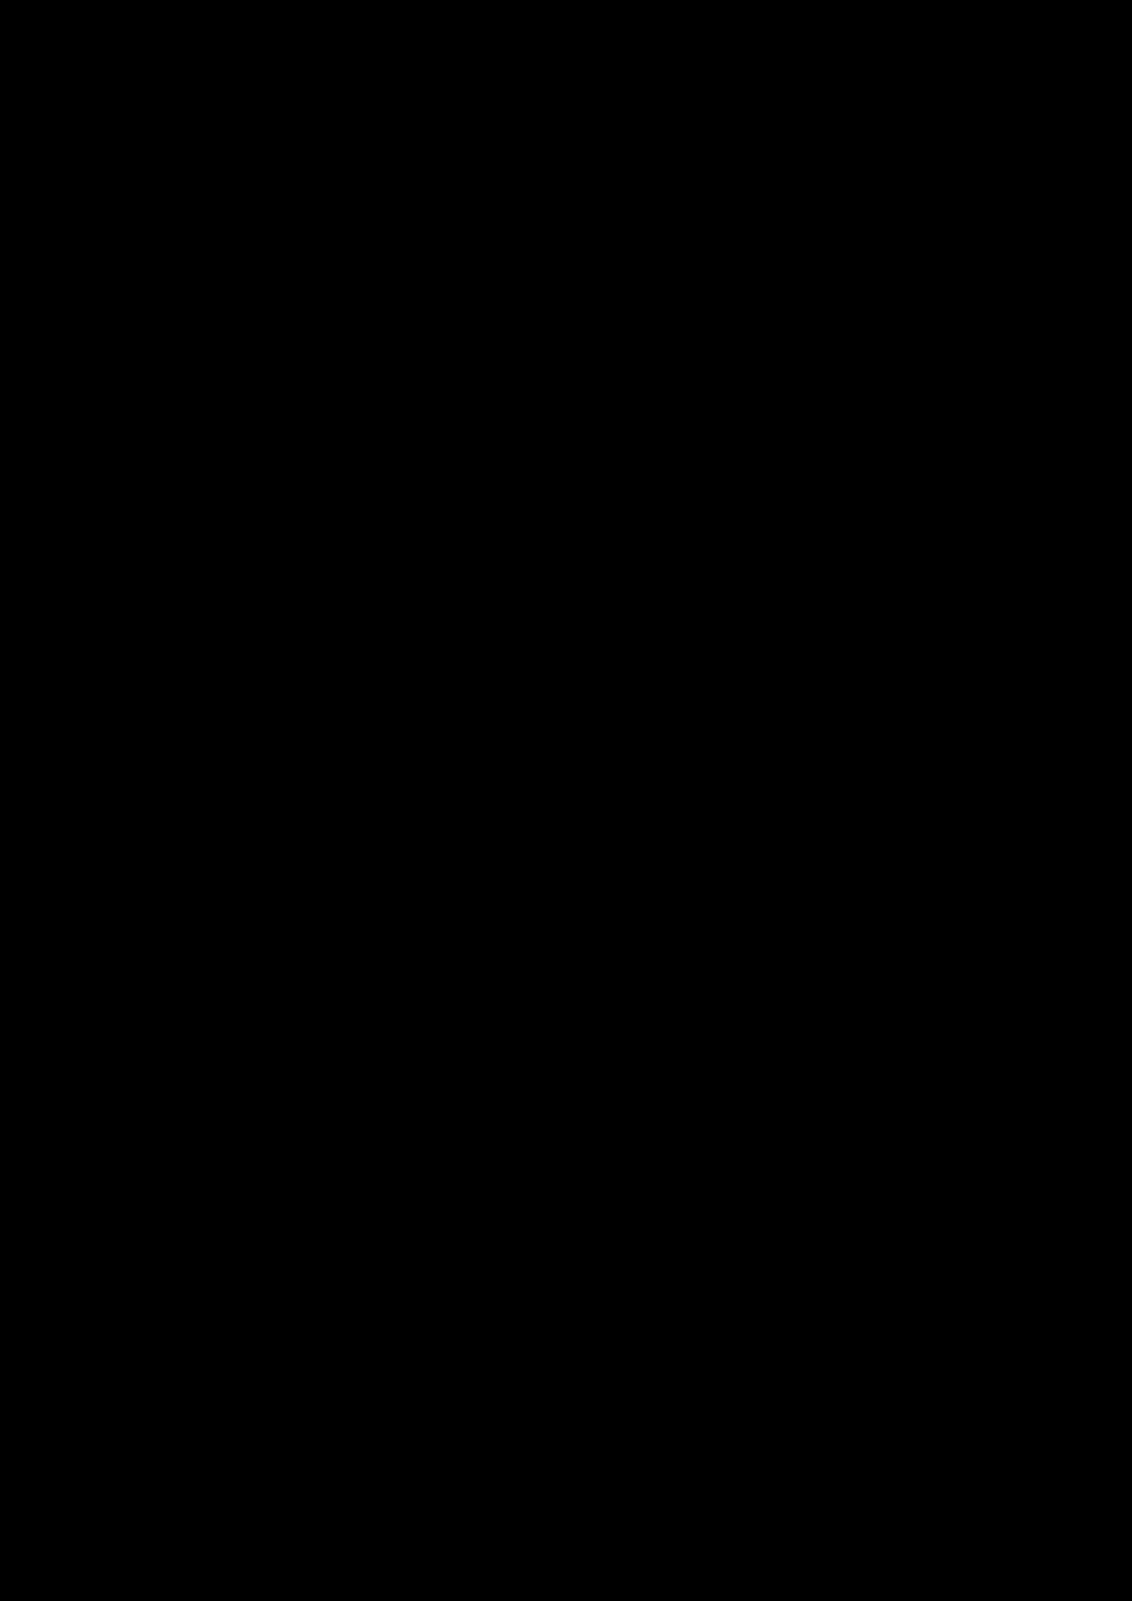 Belyiy sokol slide, Image 75